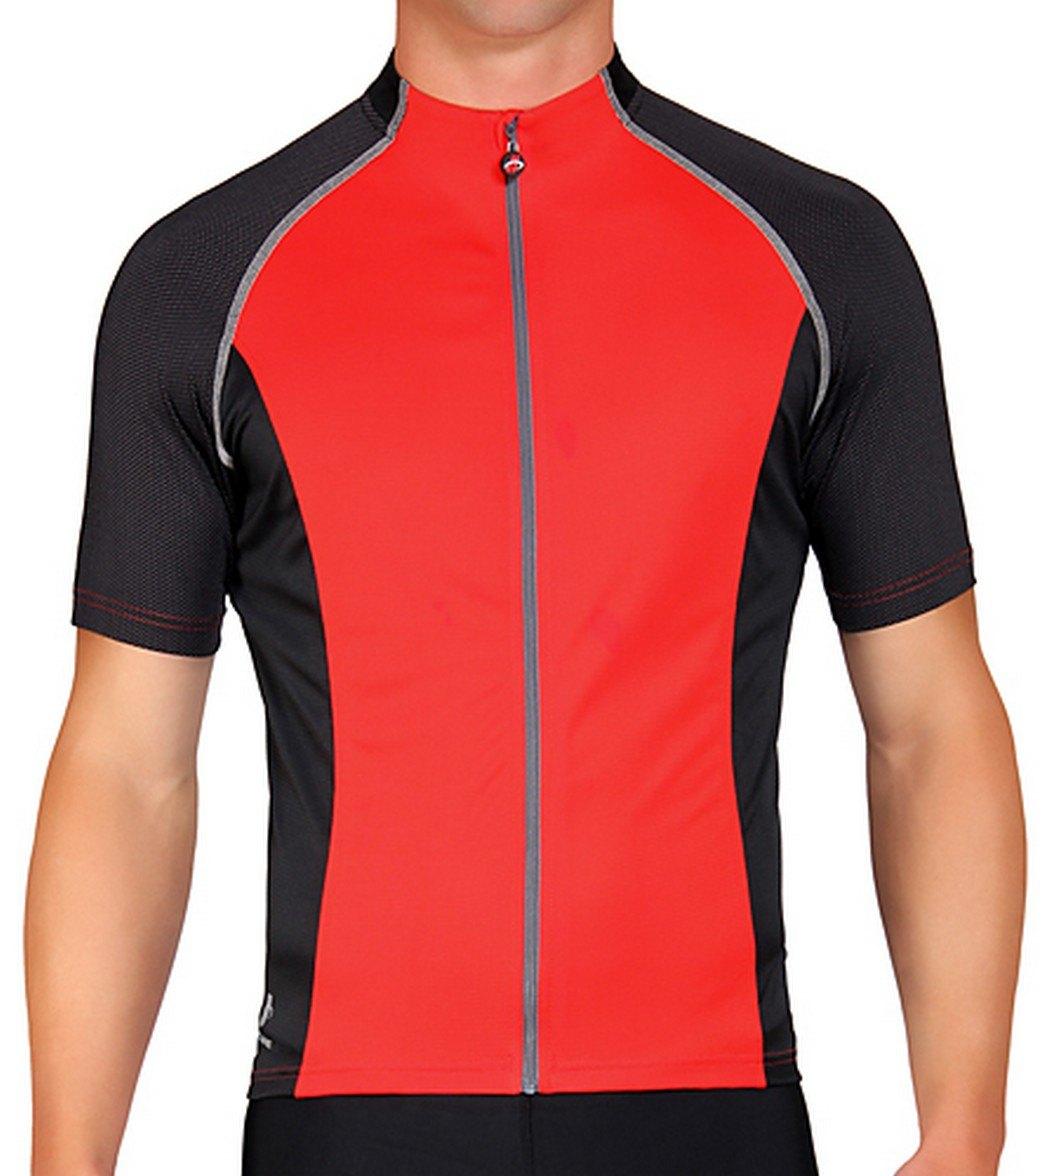 Hincapie Sportswear Men s Potenza Cycling Jersey at SwimOutlet.com - Free  Shipping f98130590